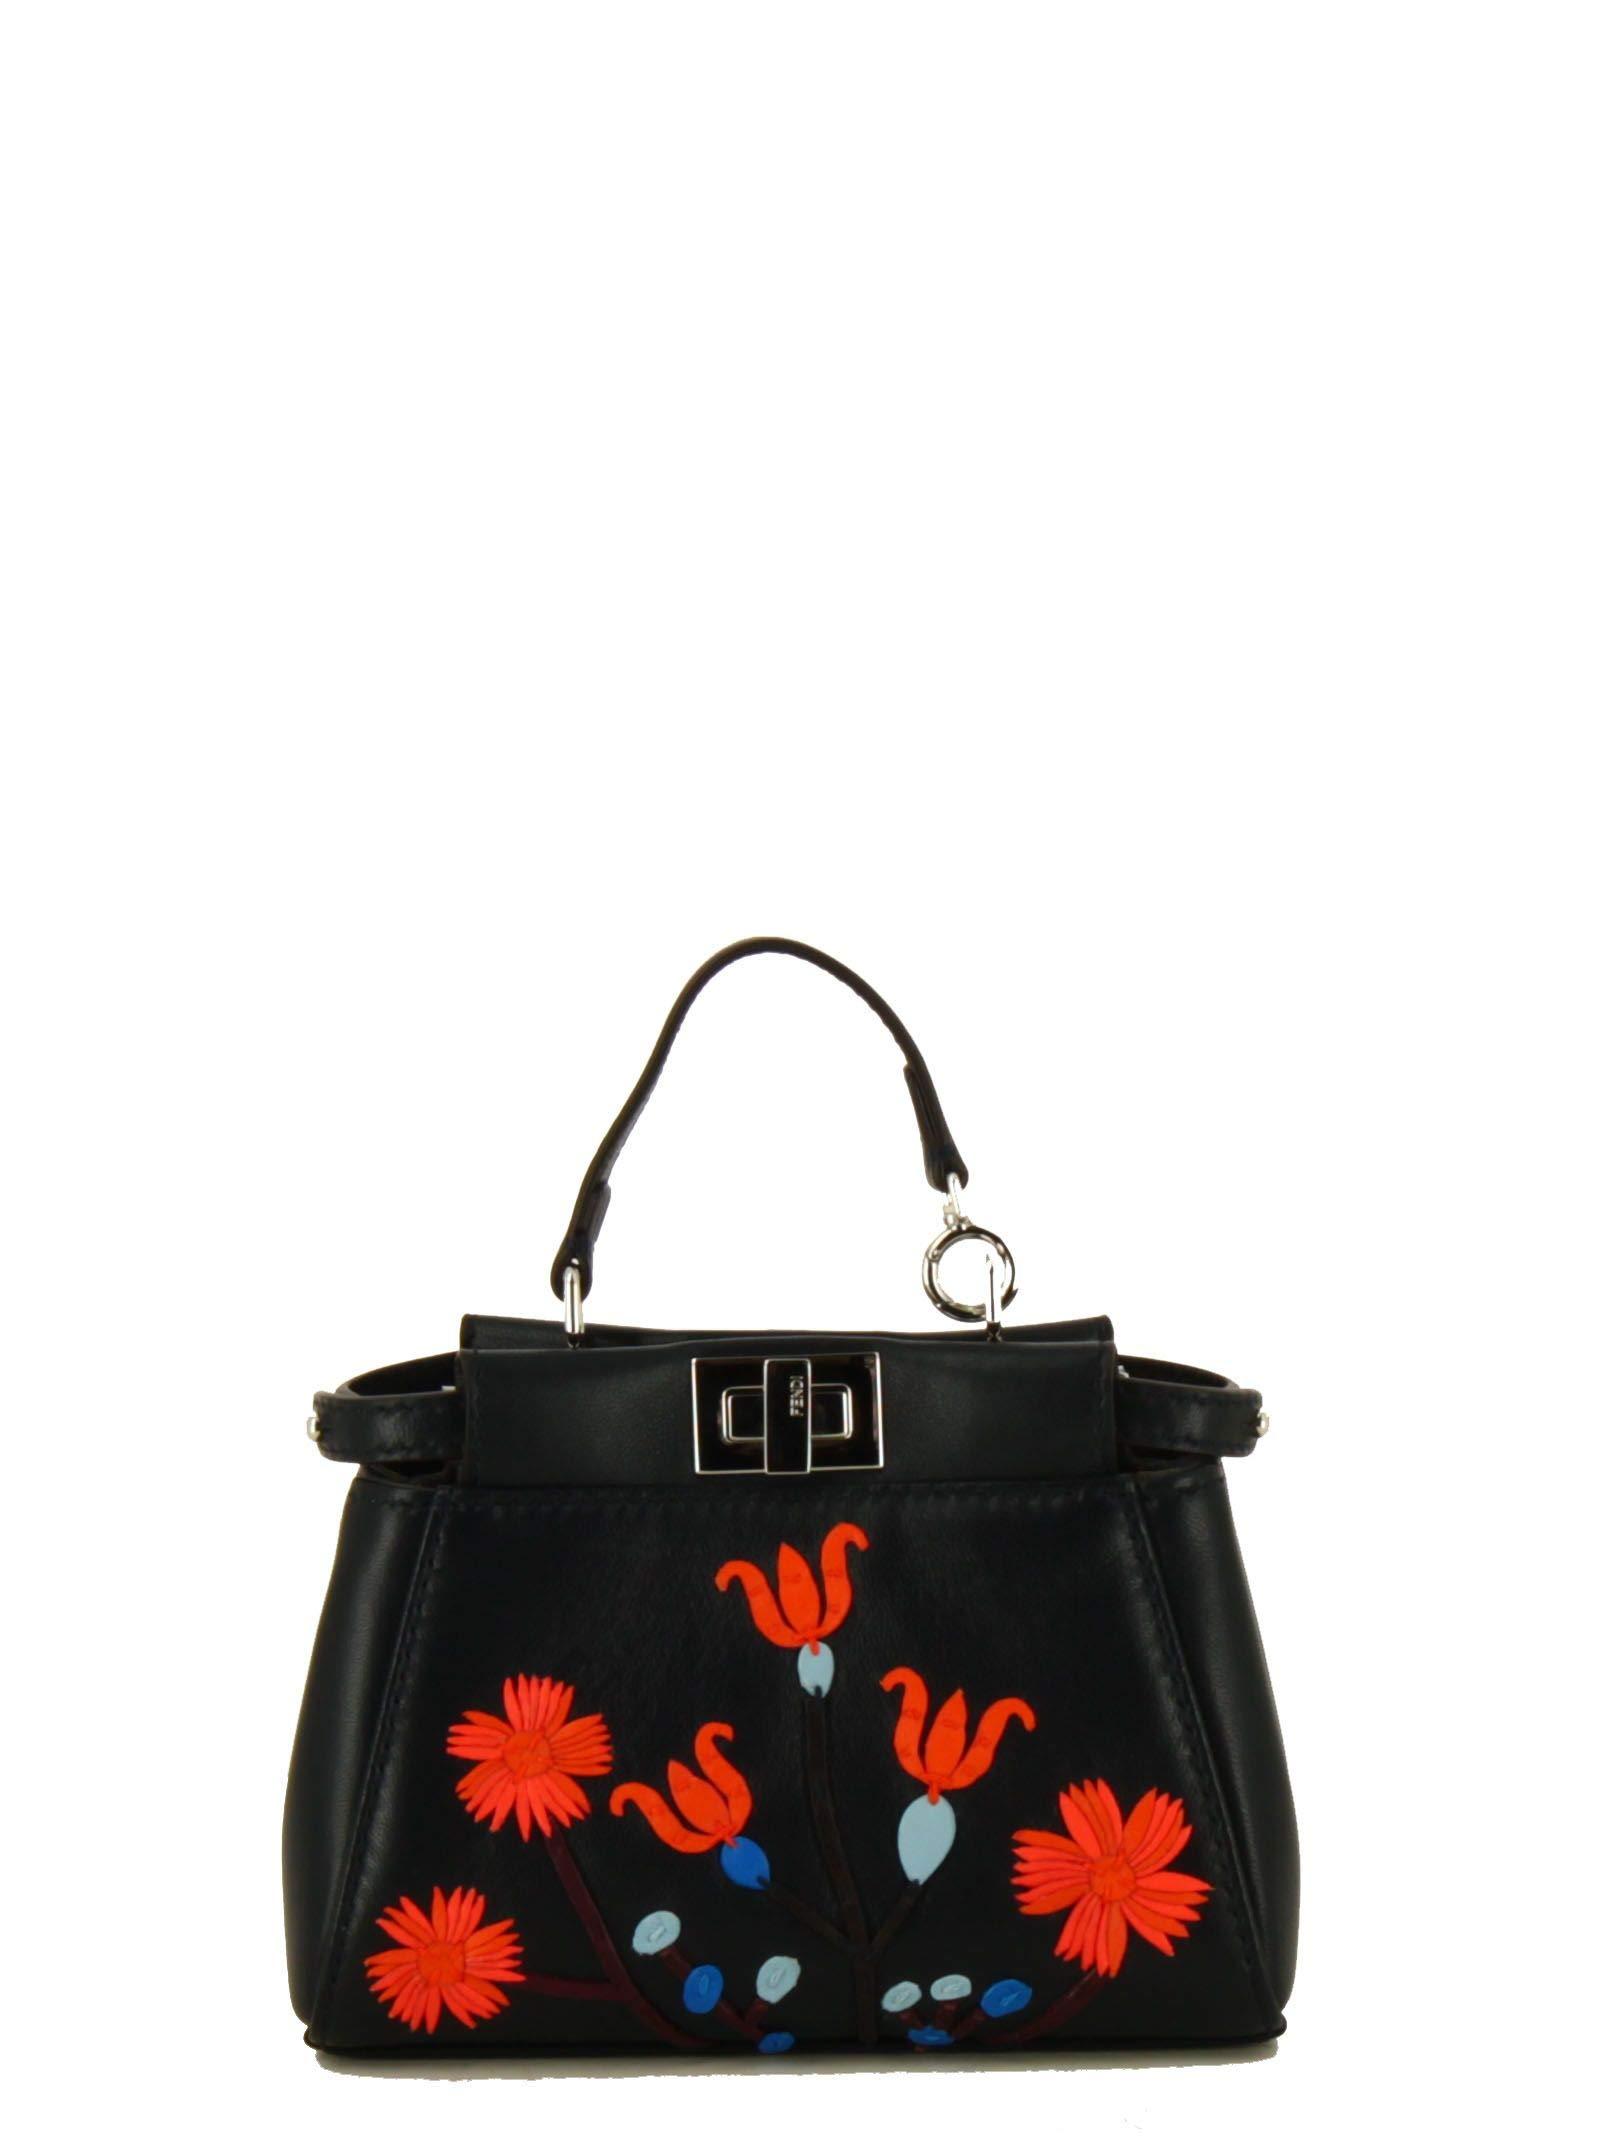 Fendi Women's 8M0355sgaf06qs-Mcf Black Leather Handbag